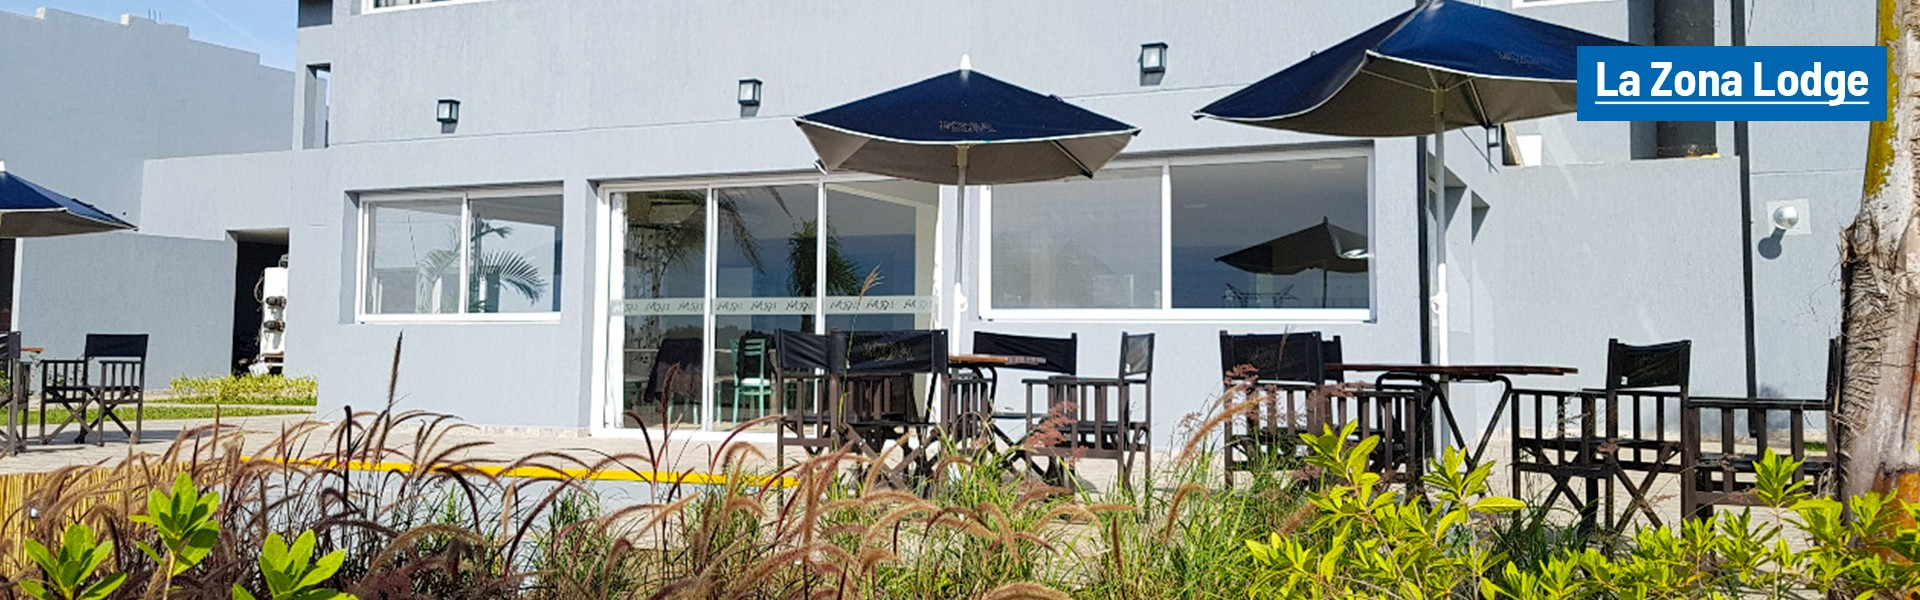 Parceria nova: La Zona Lodge e Fish TV